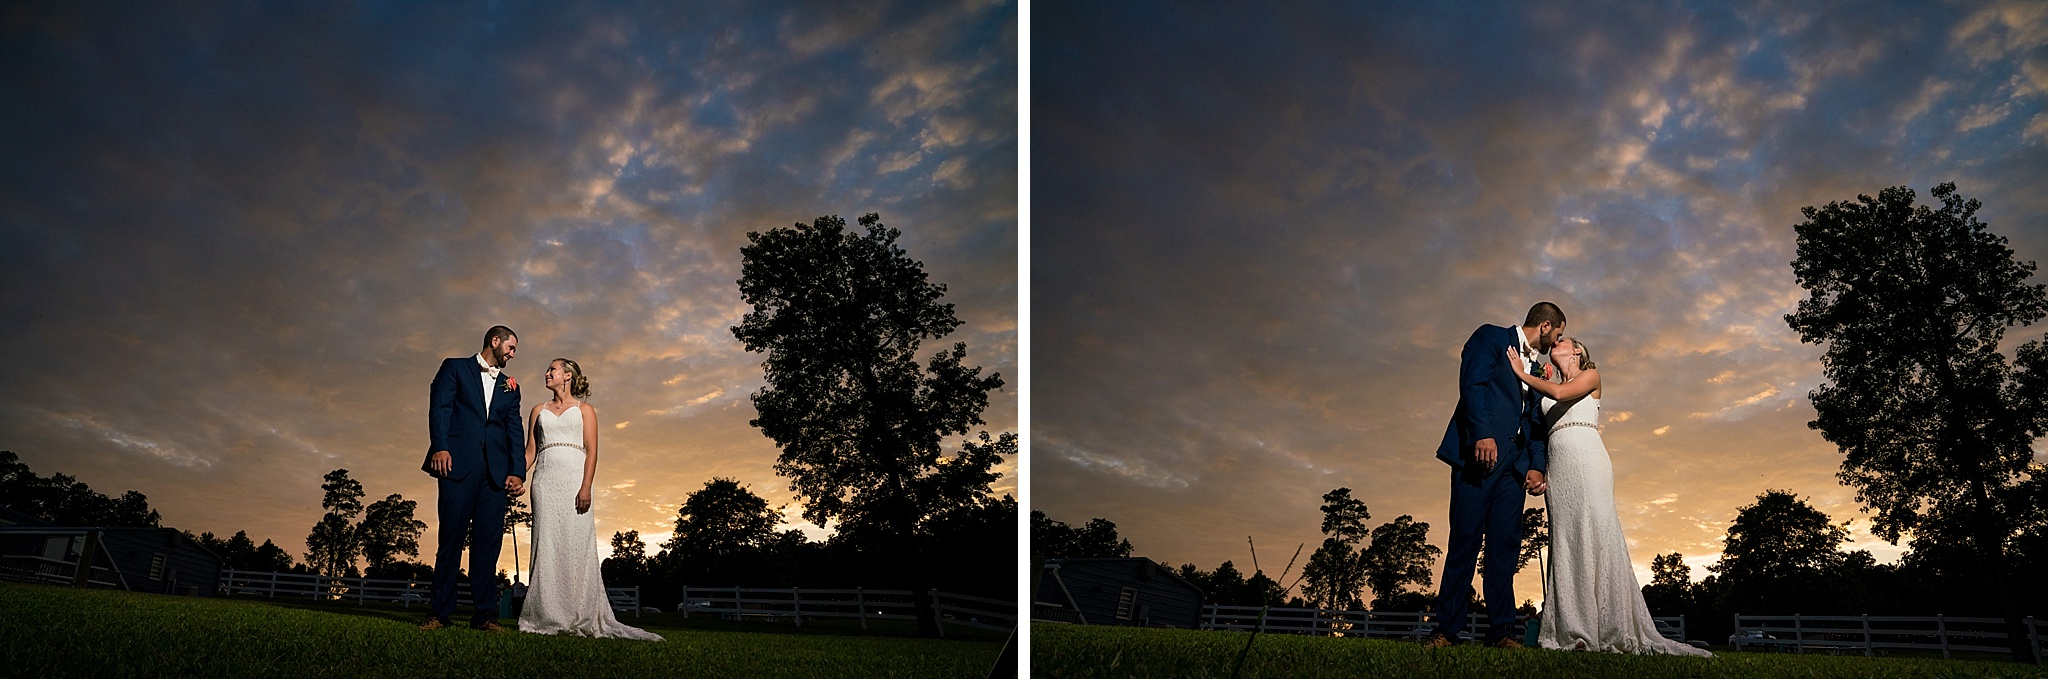 Smithfield-NC-Photographer-073.jpg